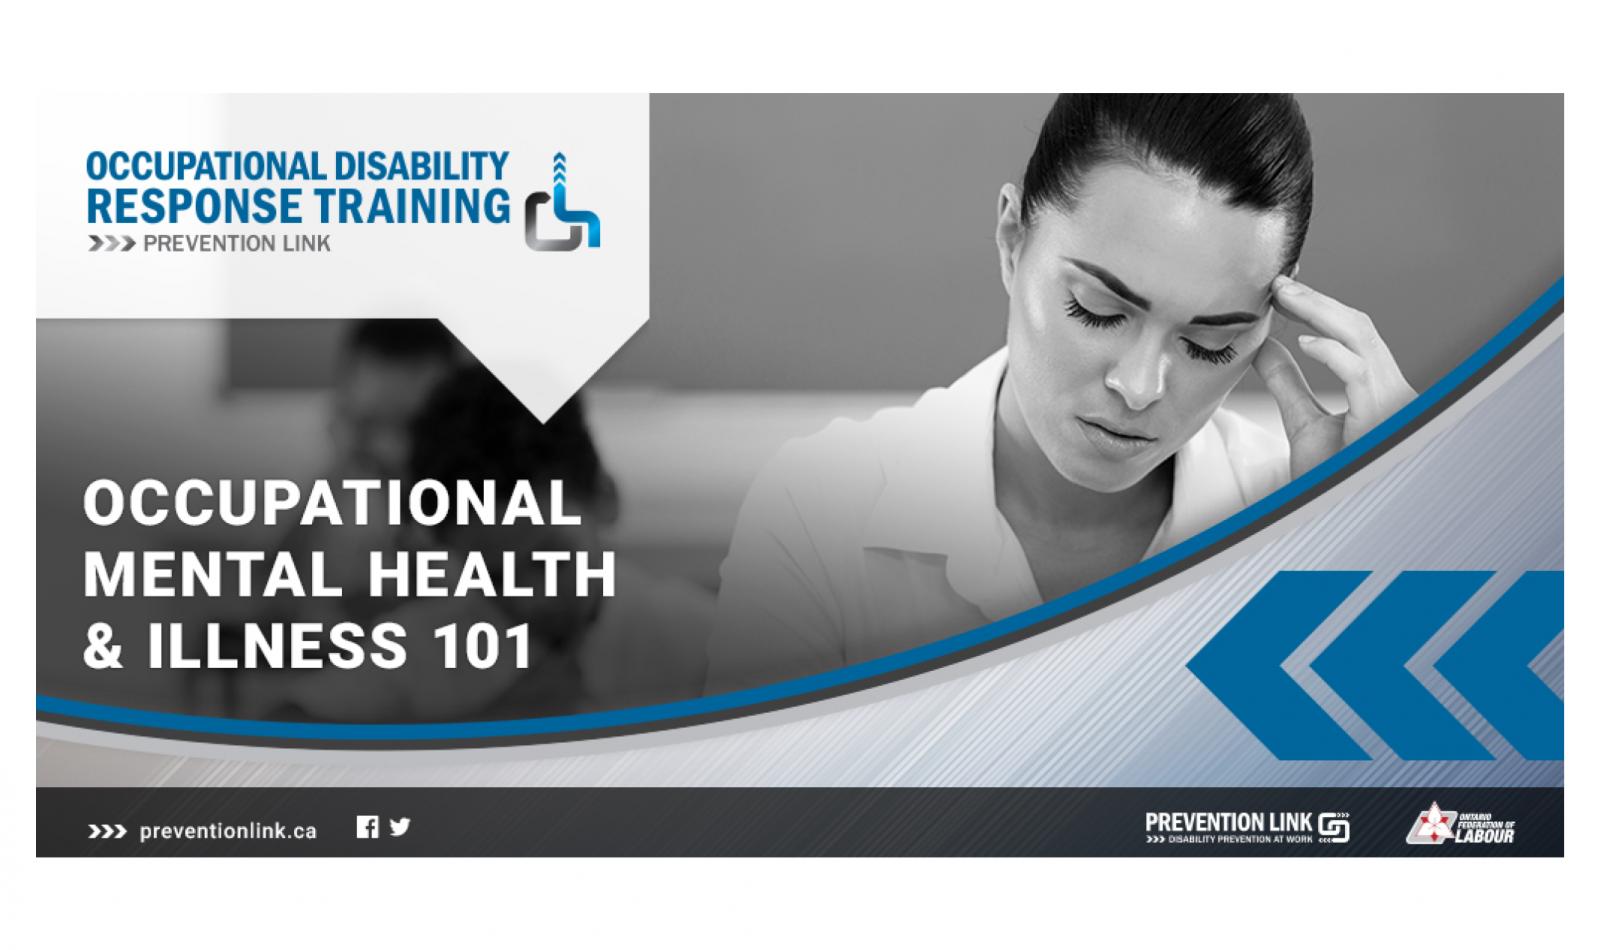 Occupational Mental Health & Illness 101